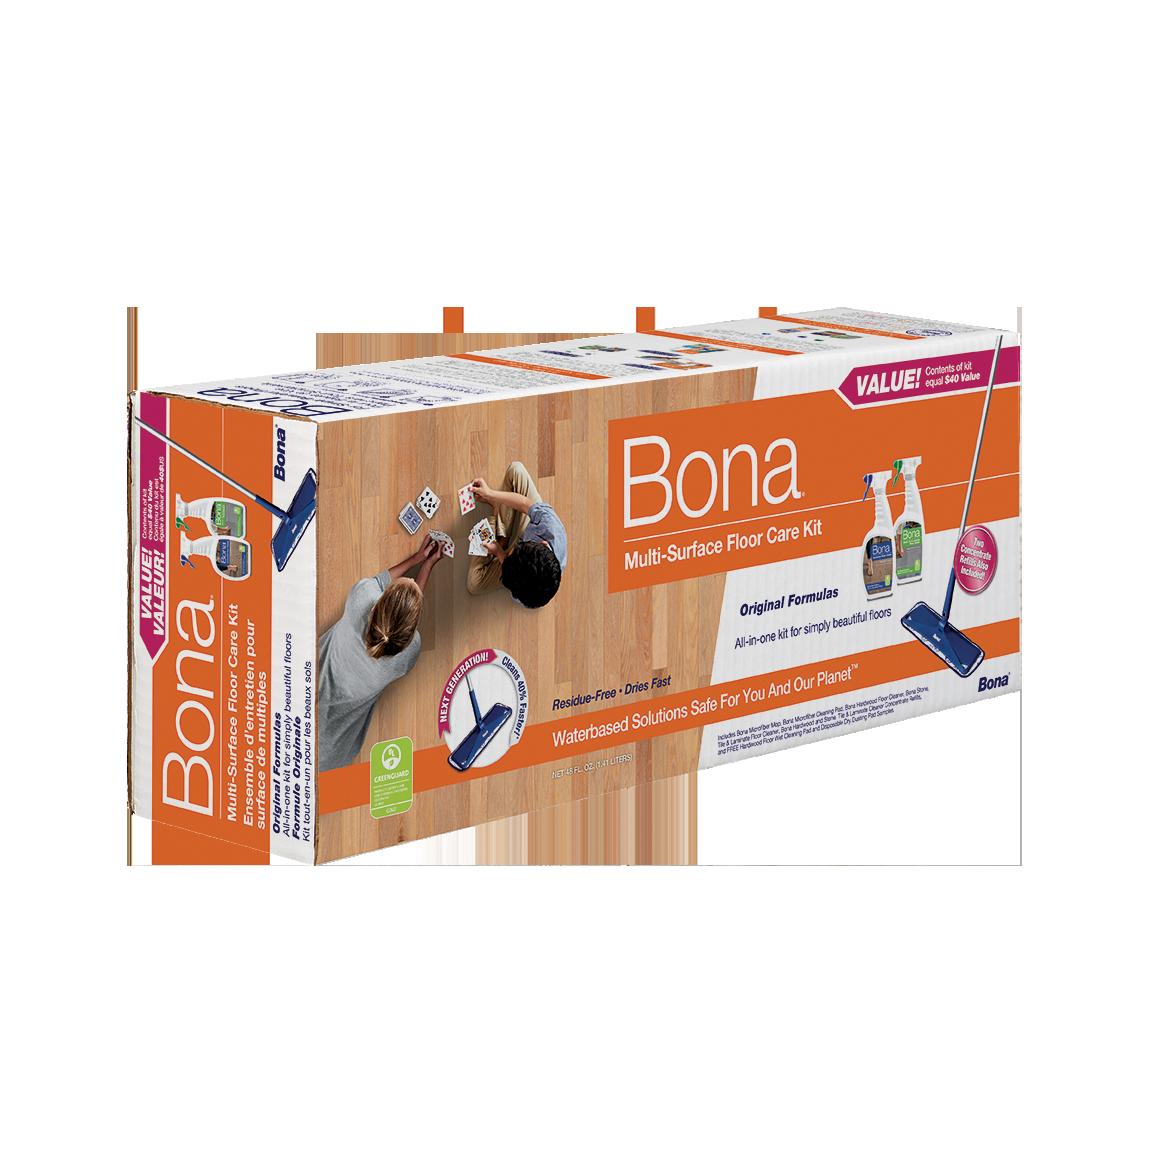 Bona® Multi-Surface Floor Care Kit